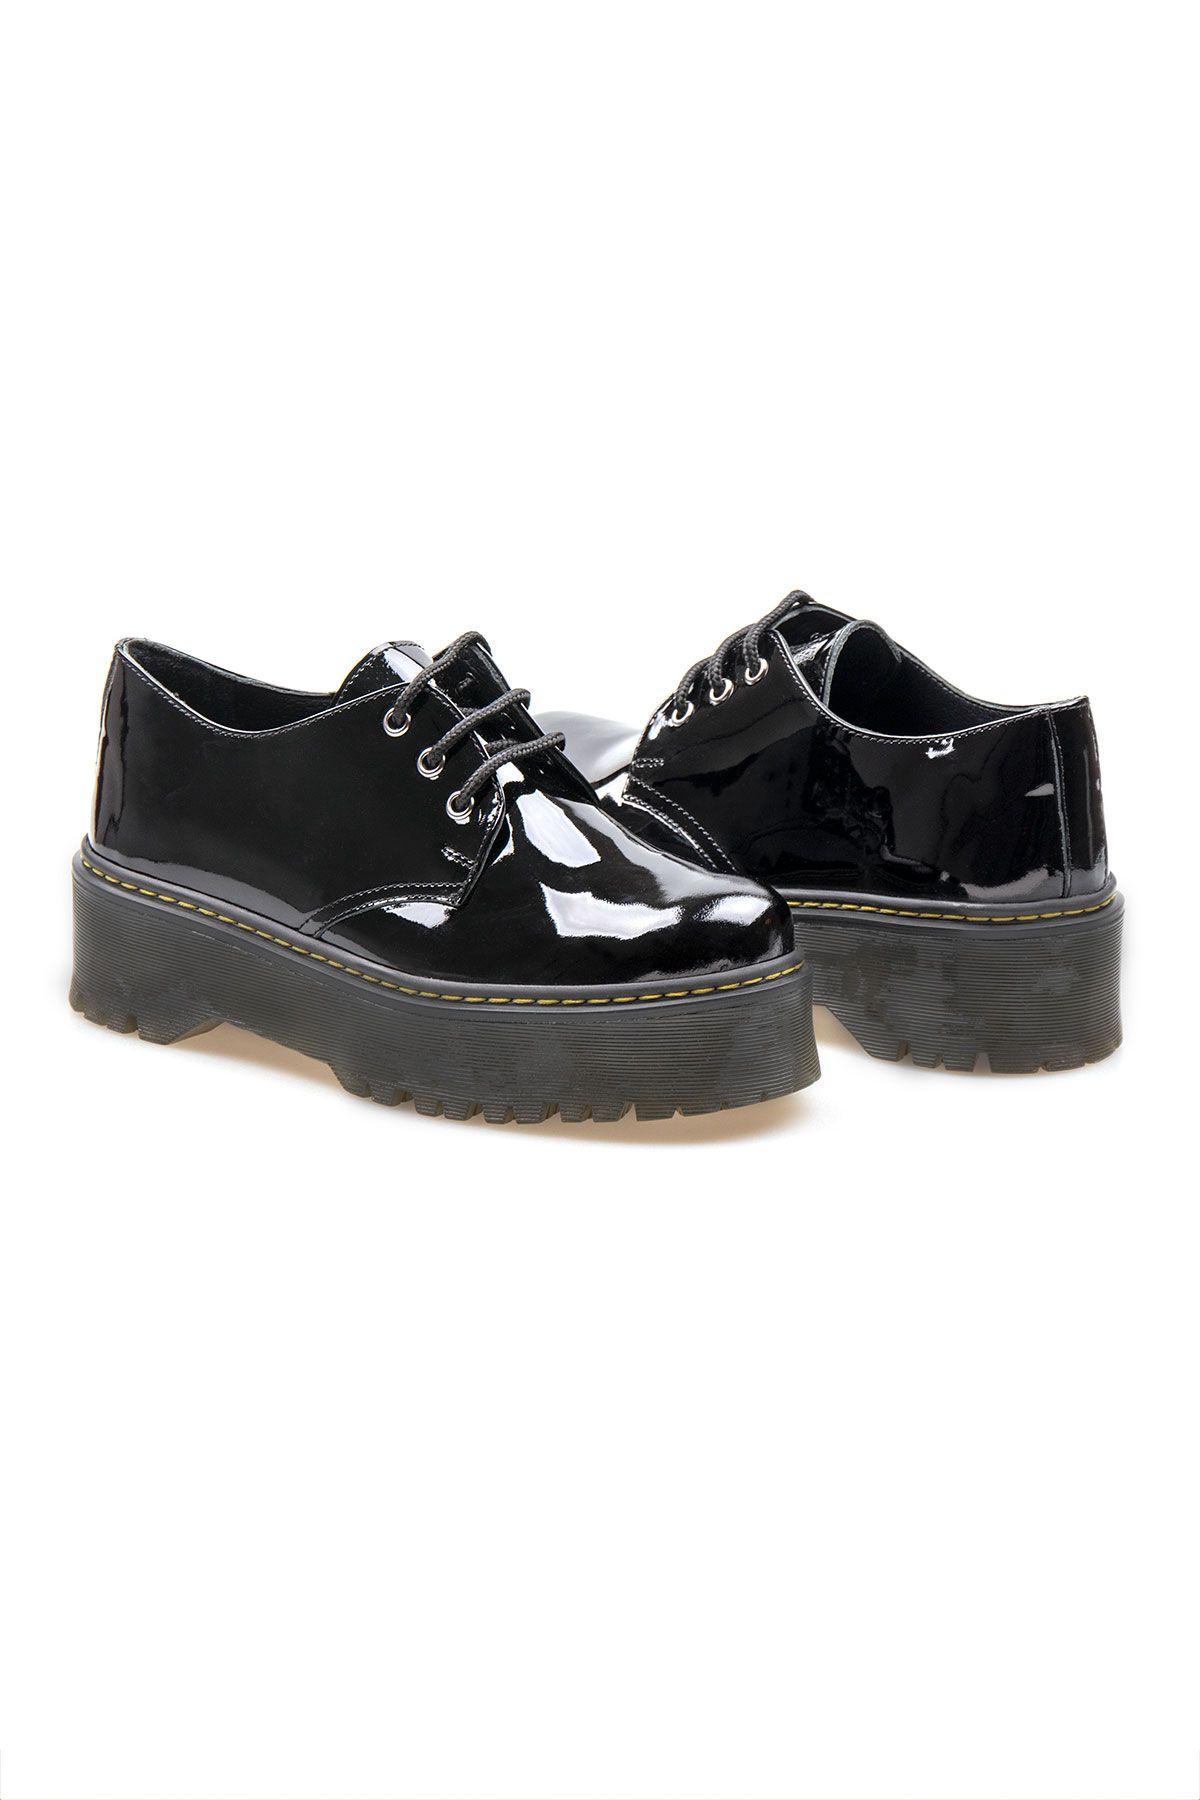 Pegia Genuine Patent Leather Women's Shoes 500700 Black